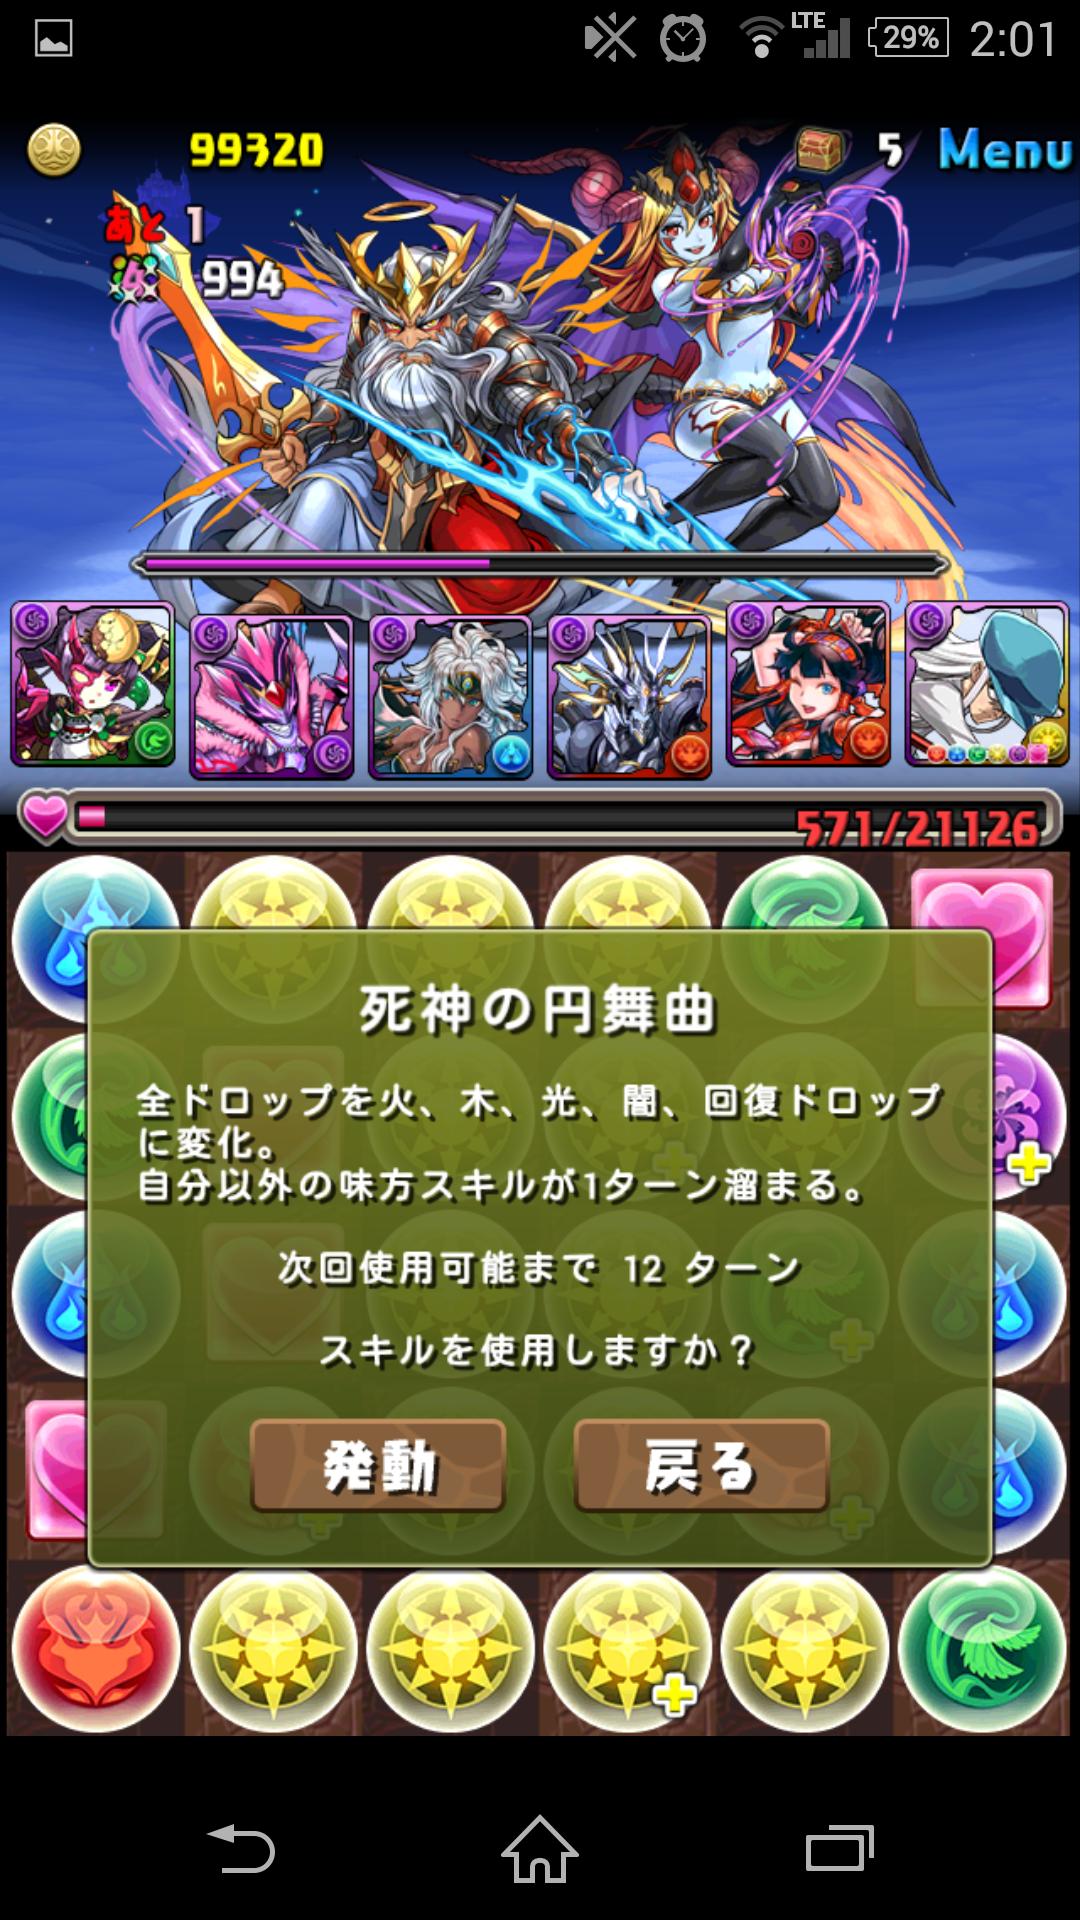 Screenshot_2015-09-01-02-01-19.png